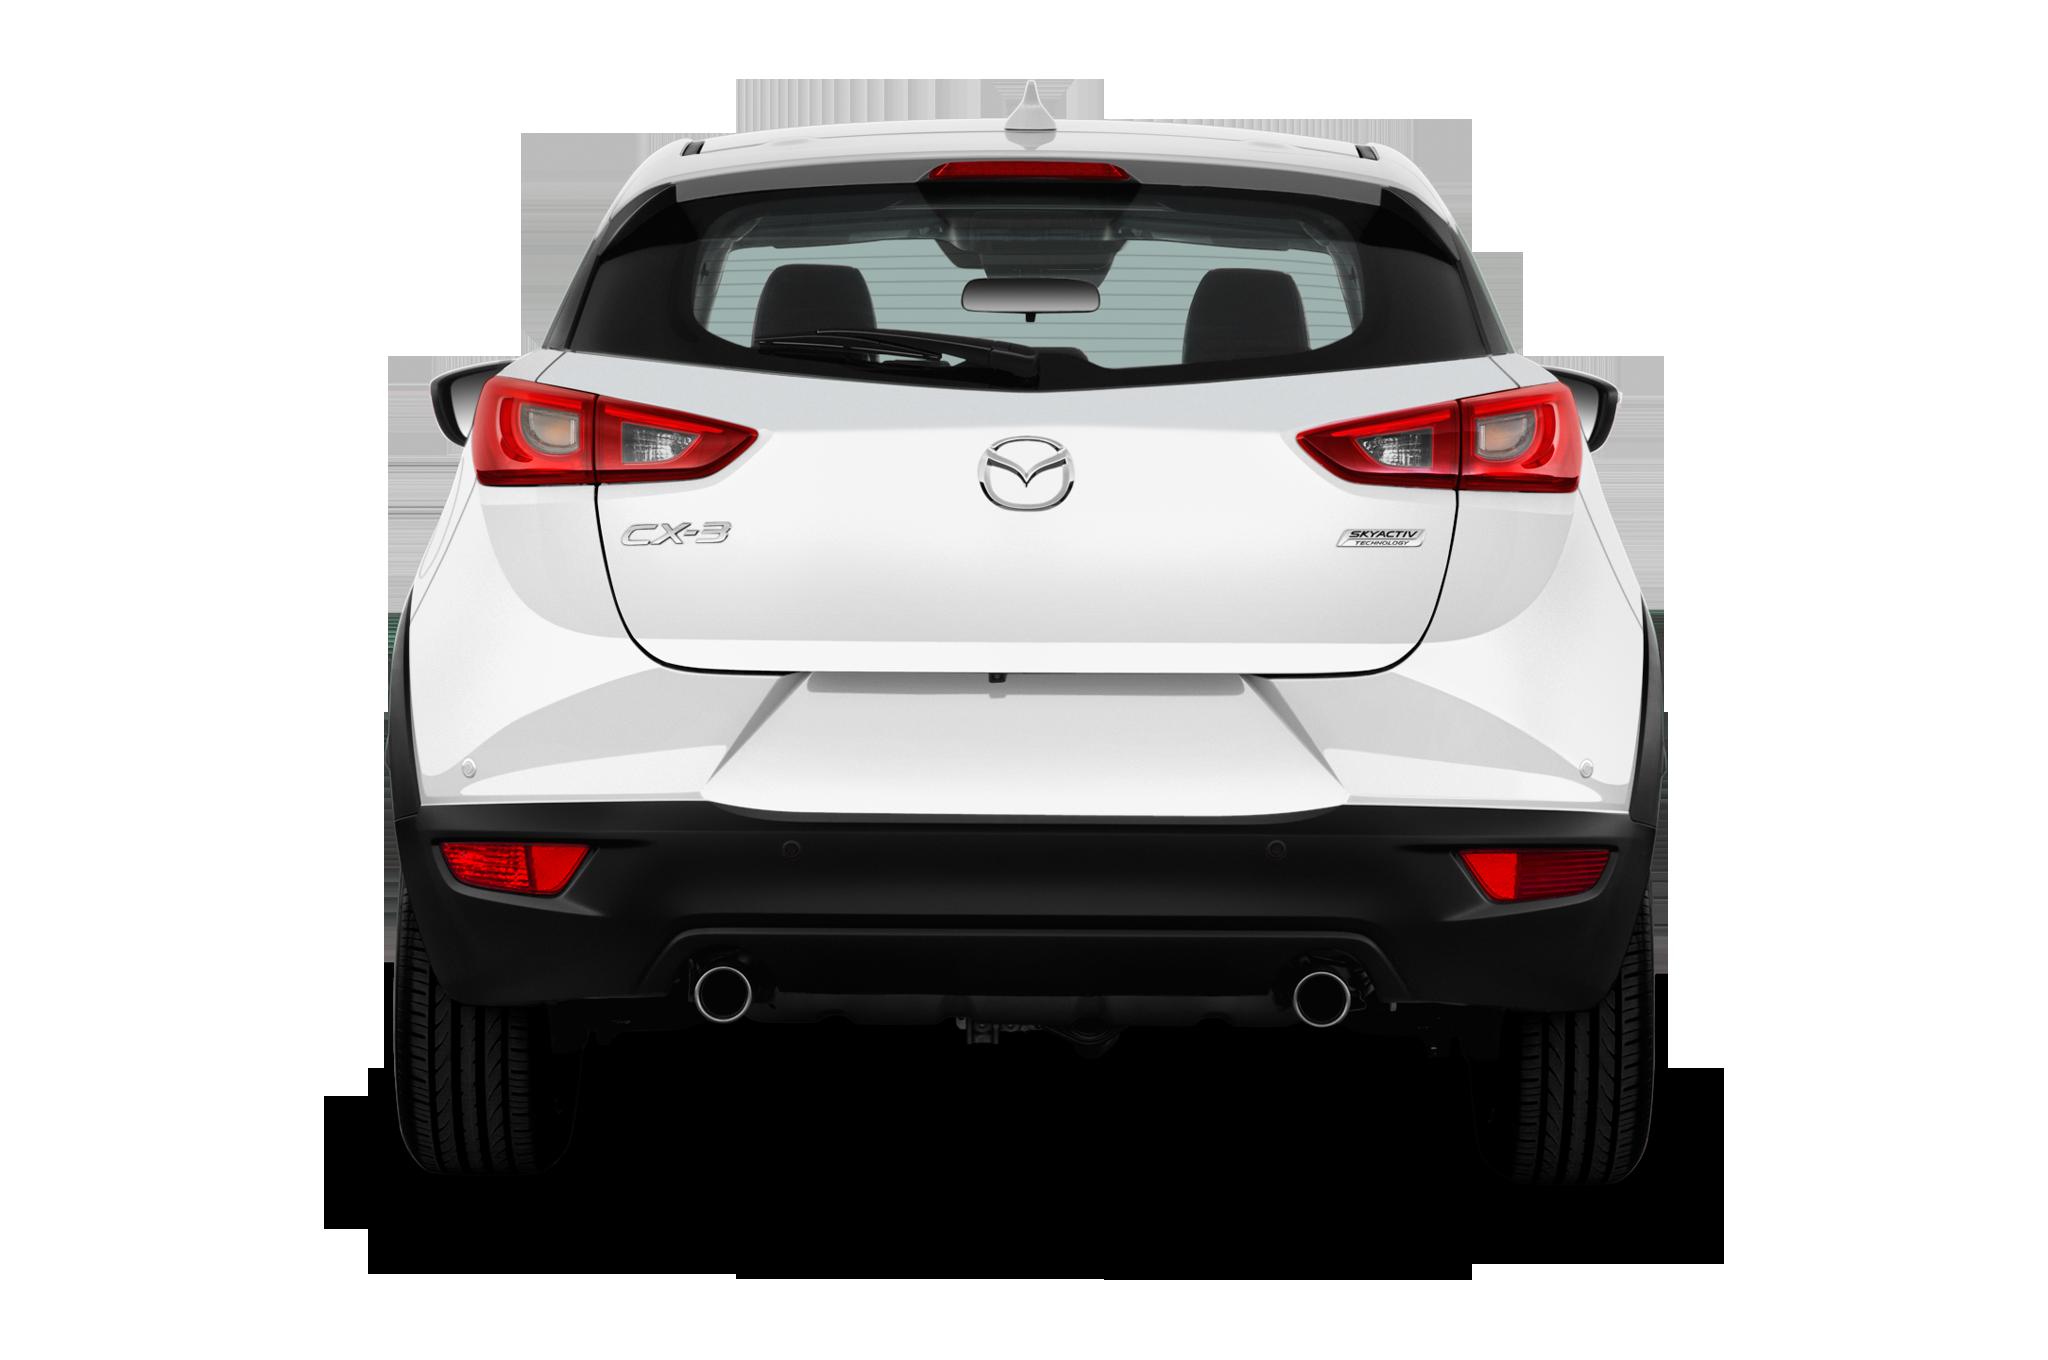 Mazda Mx3 2016 >> 2016 Mazda CX-3 Crossover Earns IIHS Top Safety Pick+   Automobile Magazine